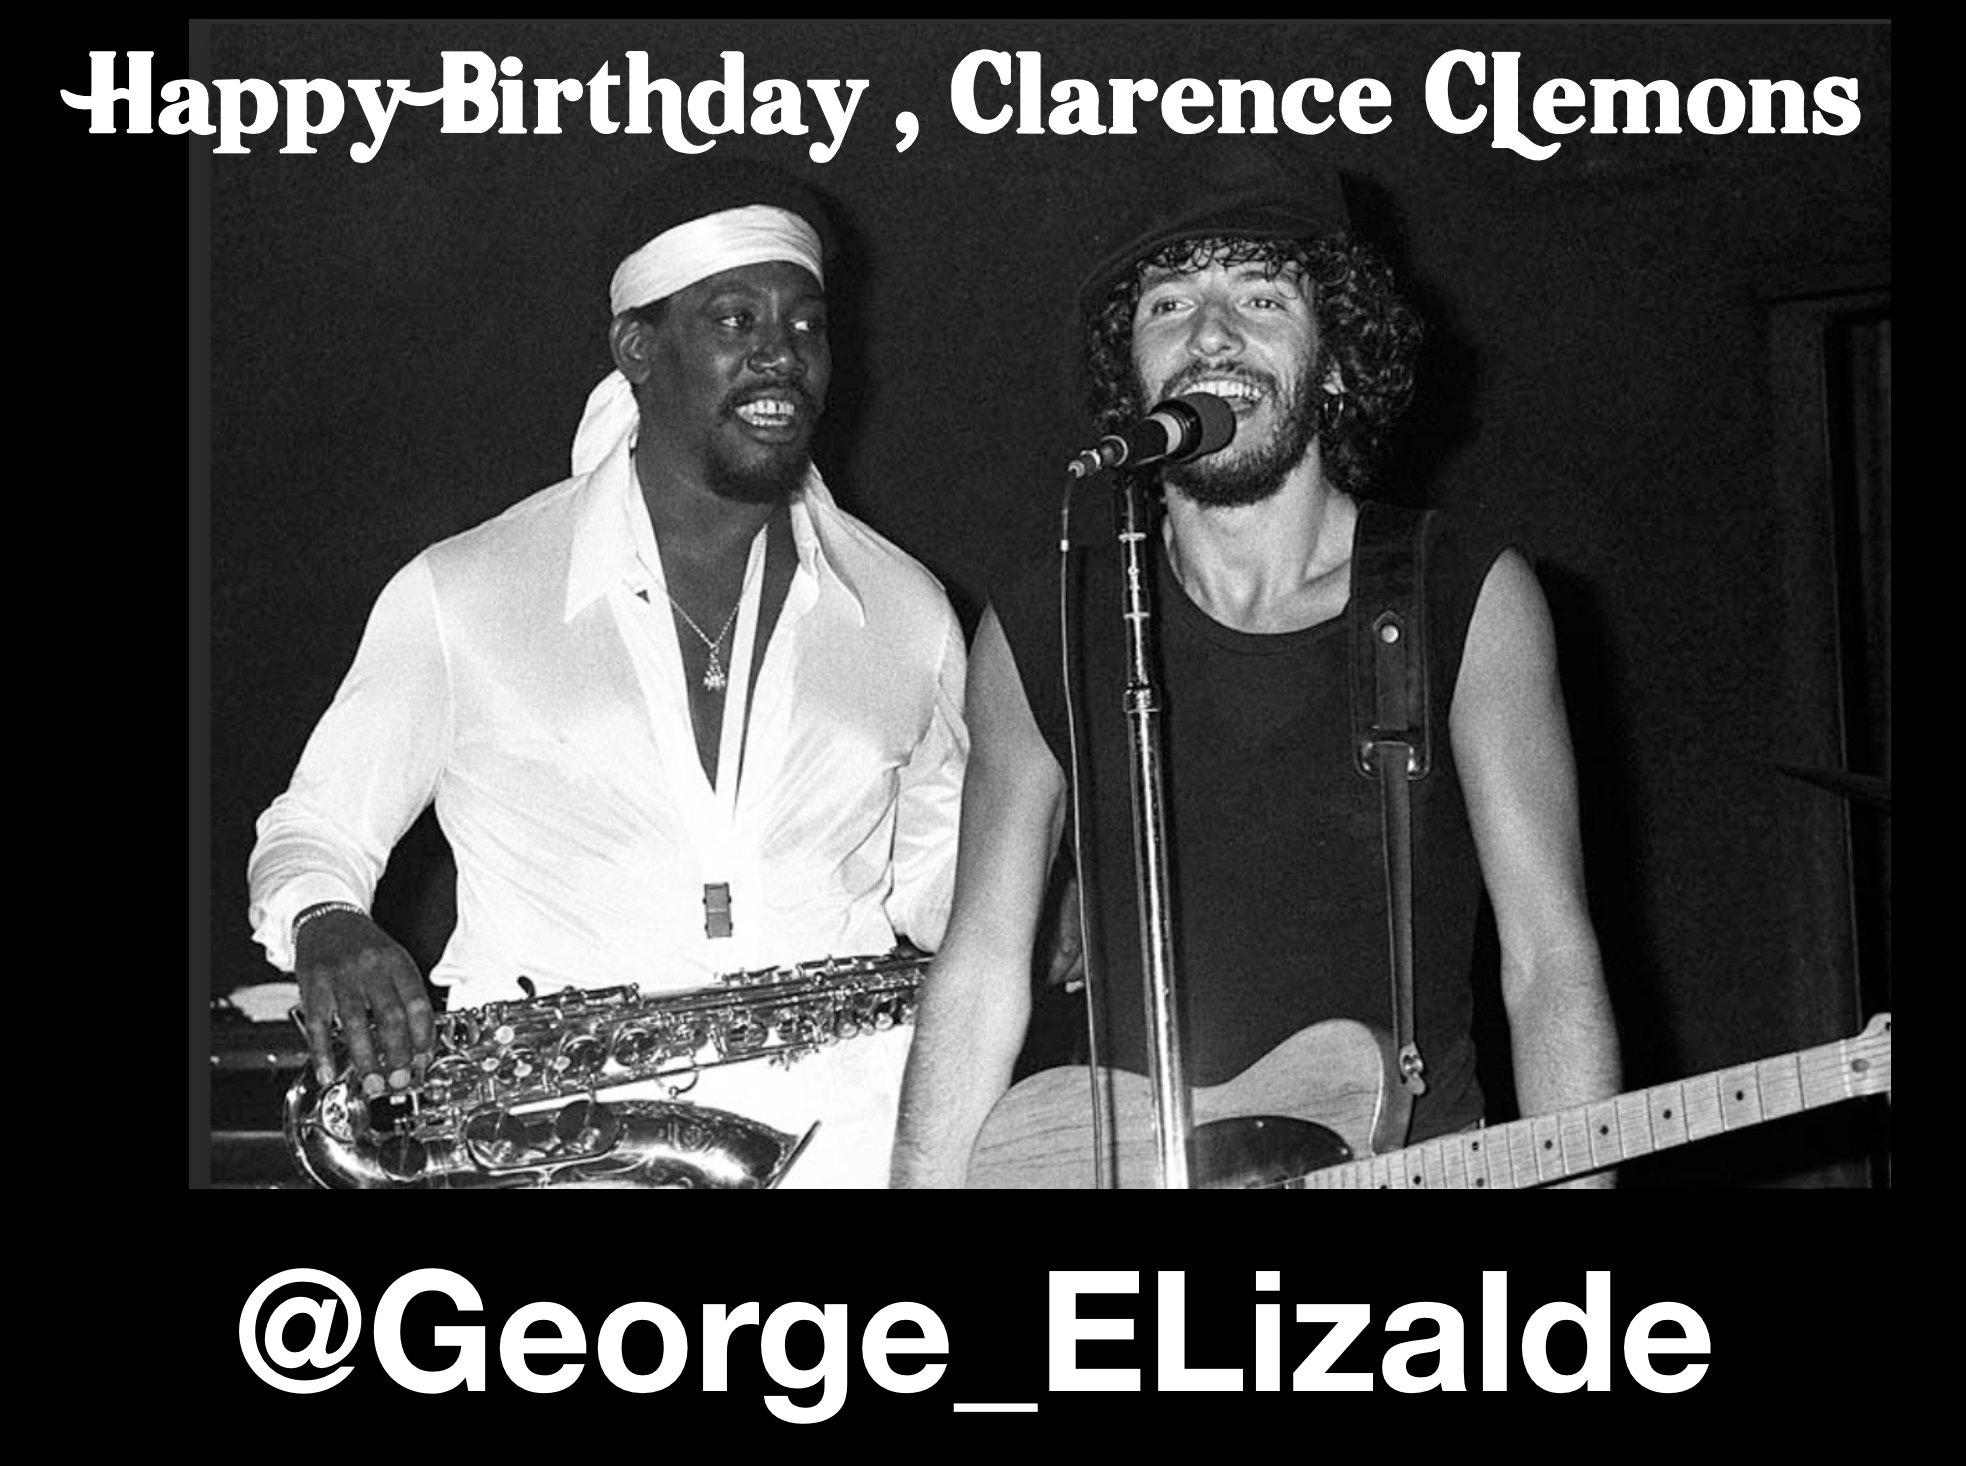 Happy Birthday, Clarence Clemons!!!